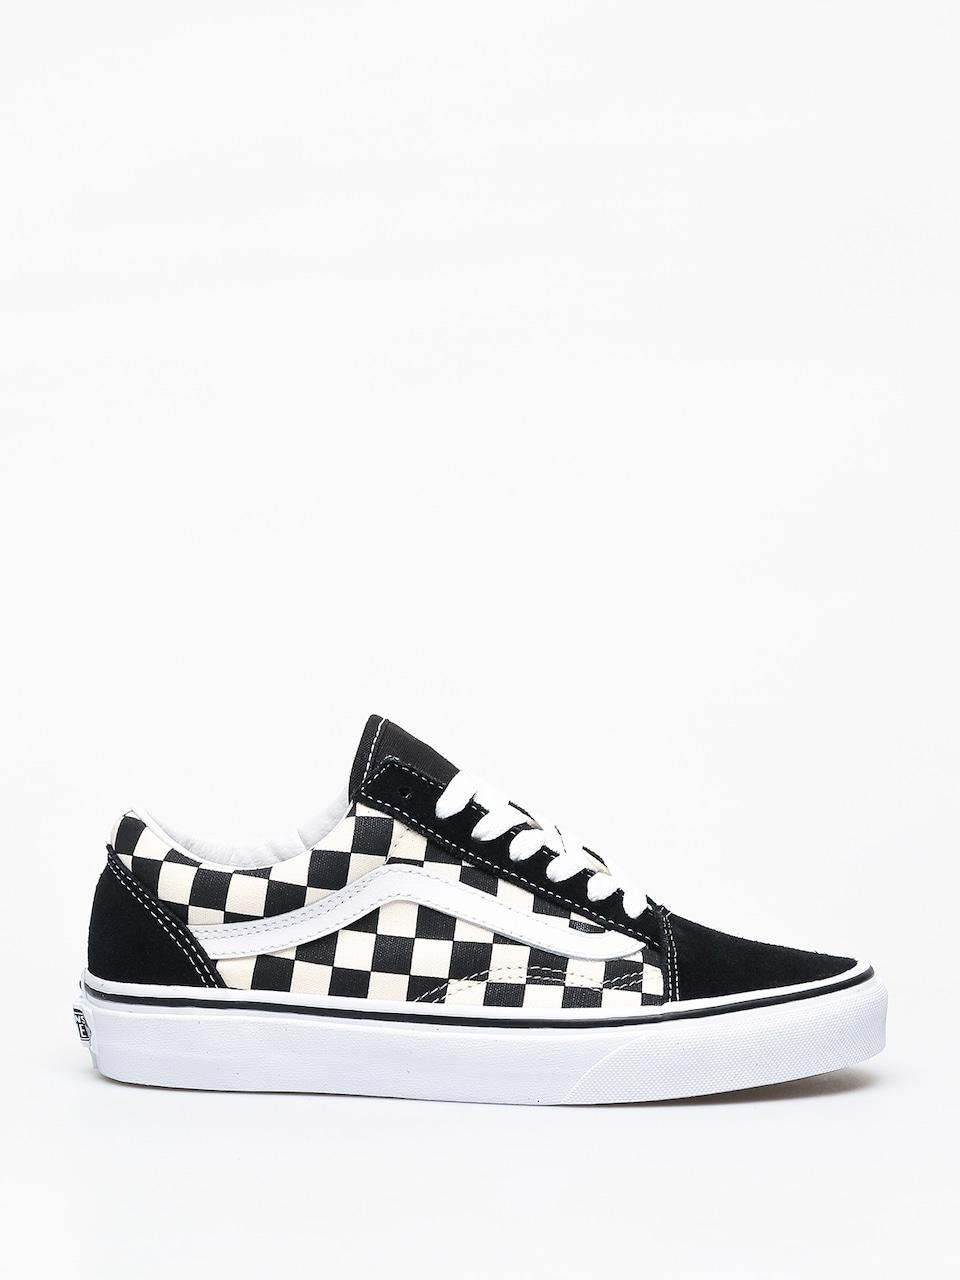 All shoes Vans | SUPER SHOP